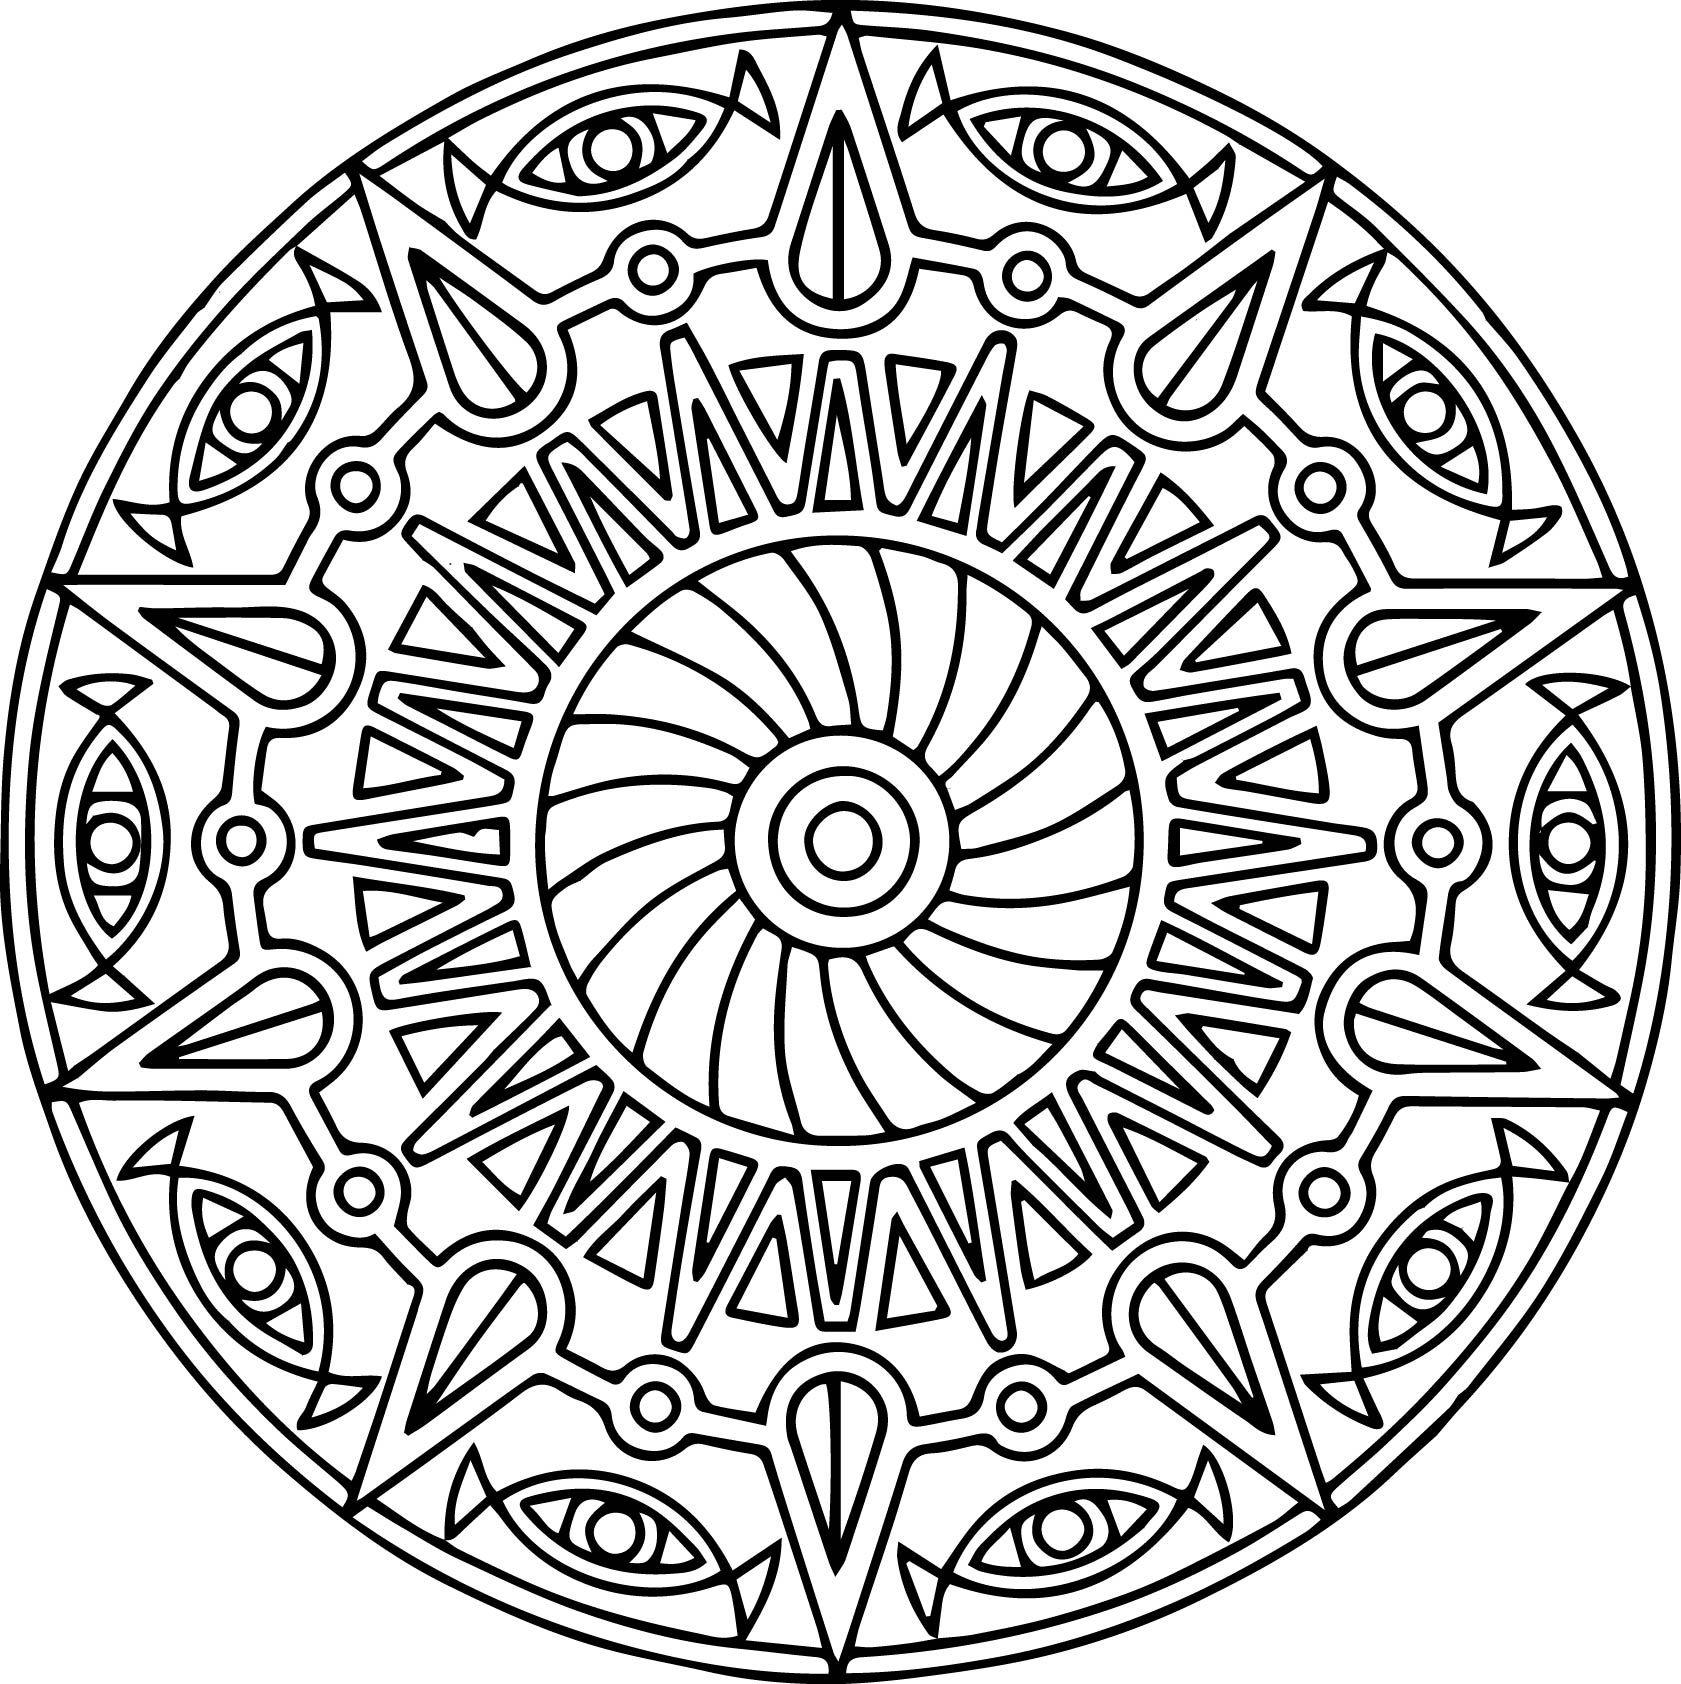 Cool Mandala Coloring Pages